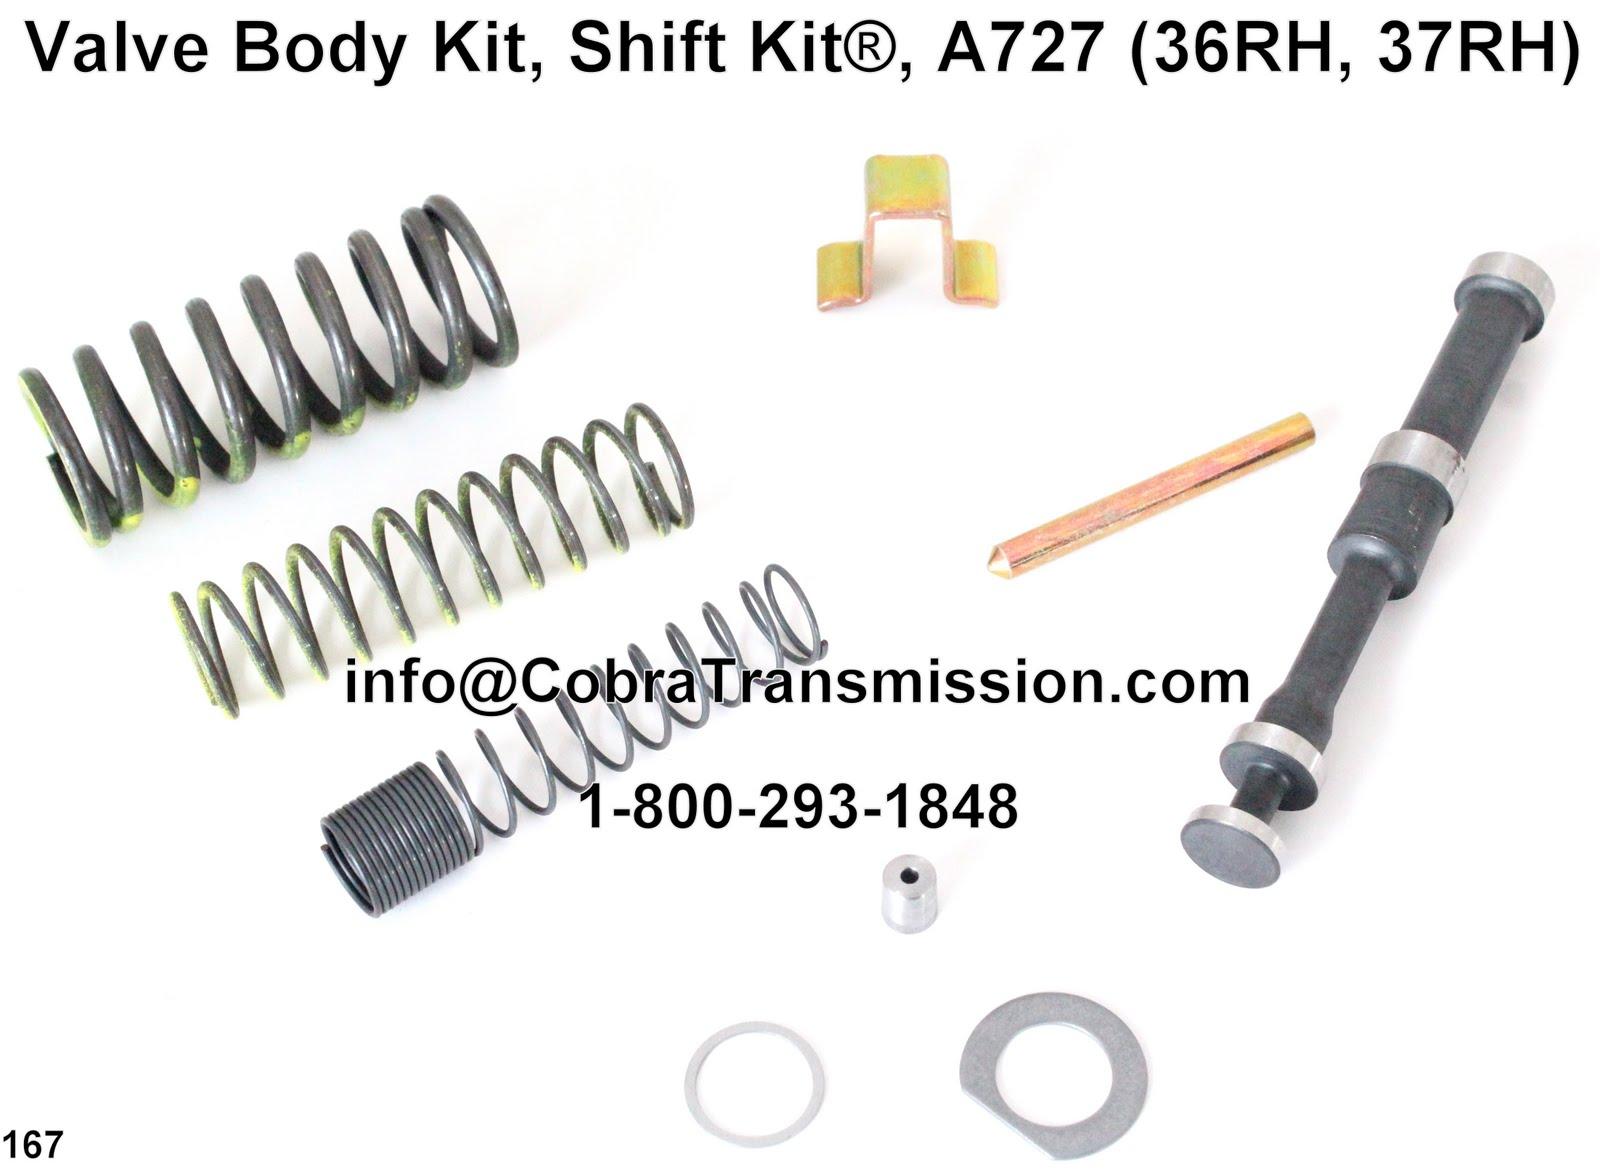 Cobra Transmission Parts 1 800 293 1848 Tf 8 Torqueflite A606 42le Wiring Diagram A 727 36 Rh 37